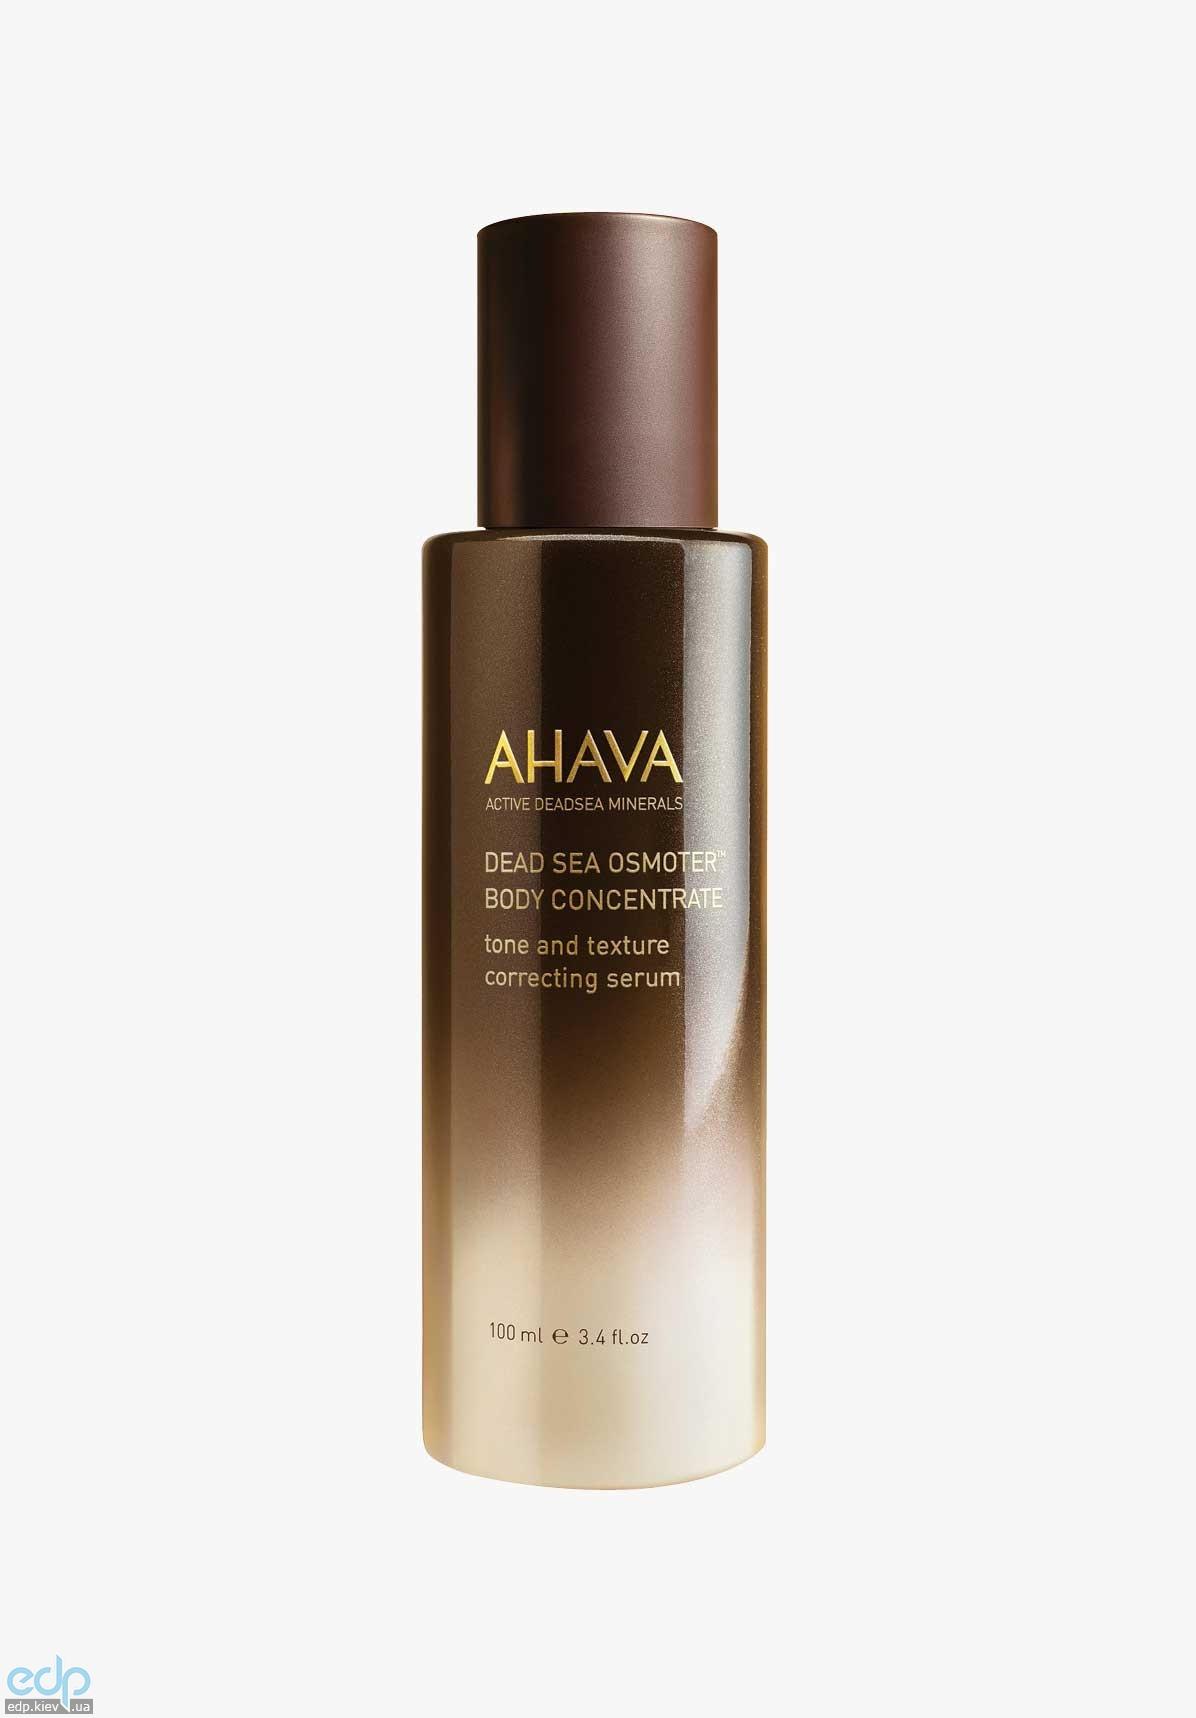 Ahava - Сыворотка Osmoter для тела - Dead Sea Osmoter Body Concentrate - 100 ml